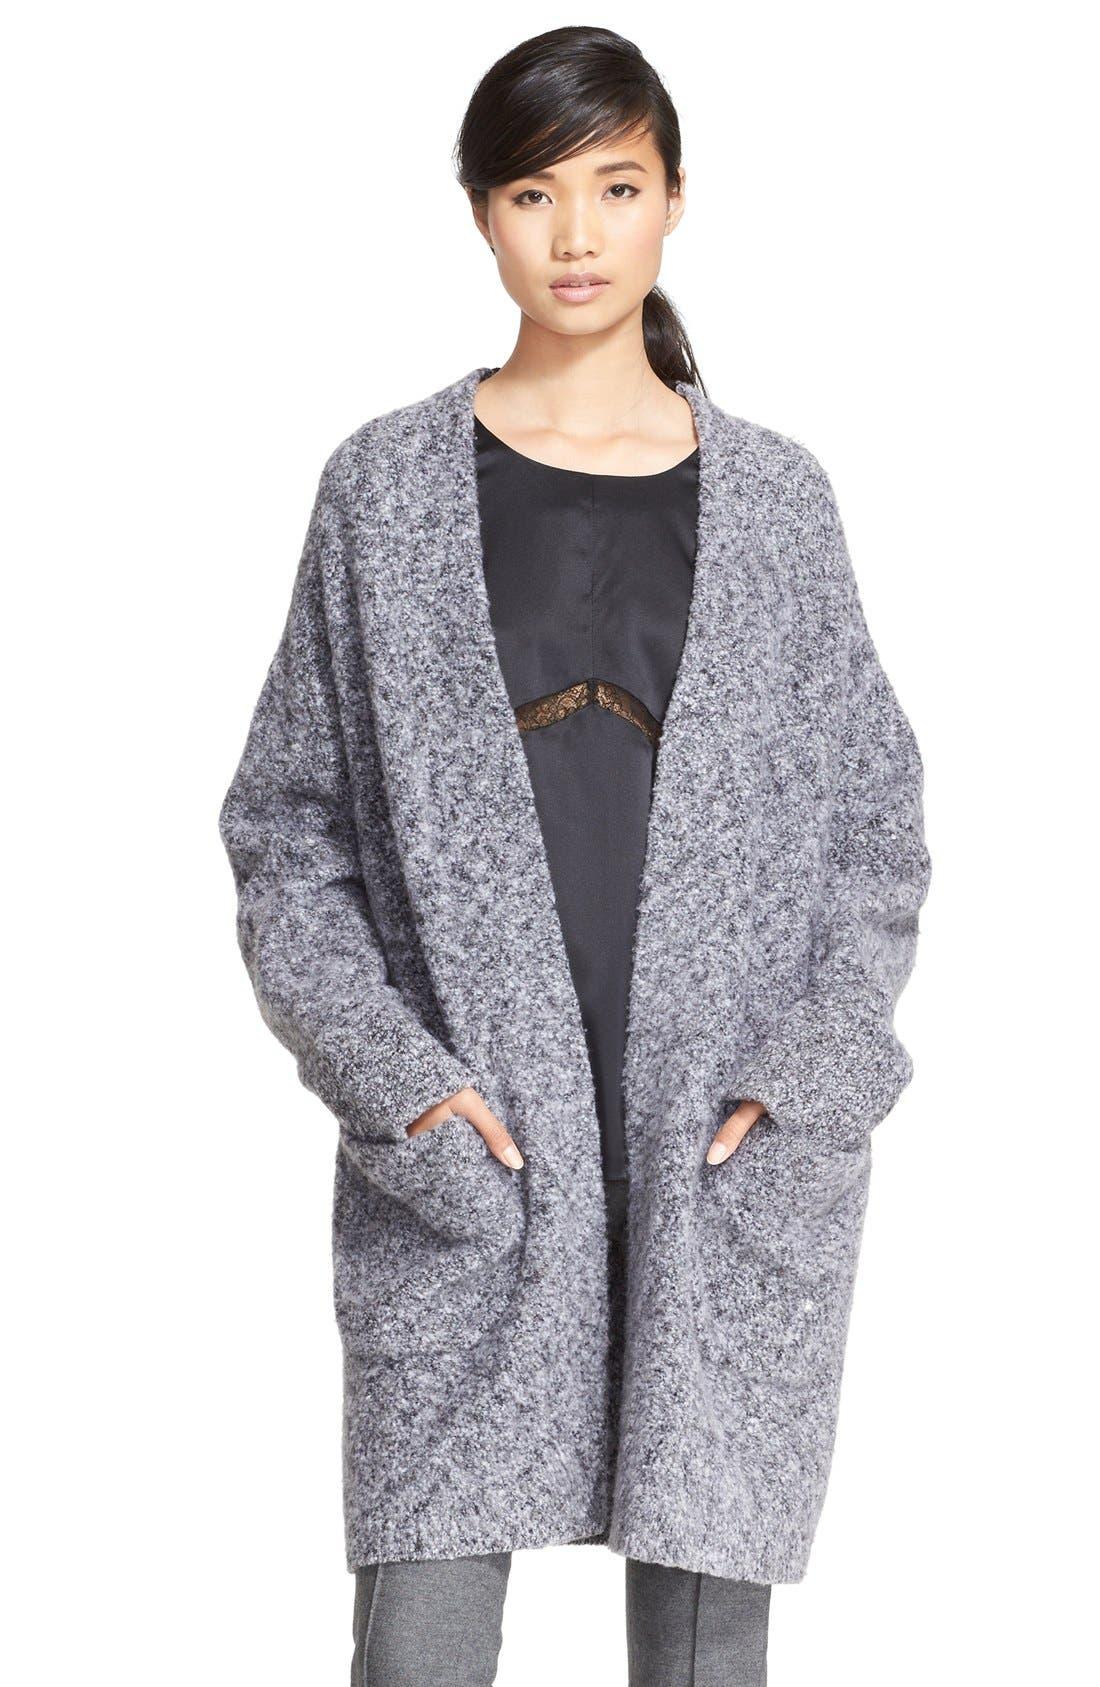 Main Image - rag & bone 'Diana' Wool Blend Sweater Coat